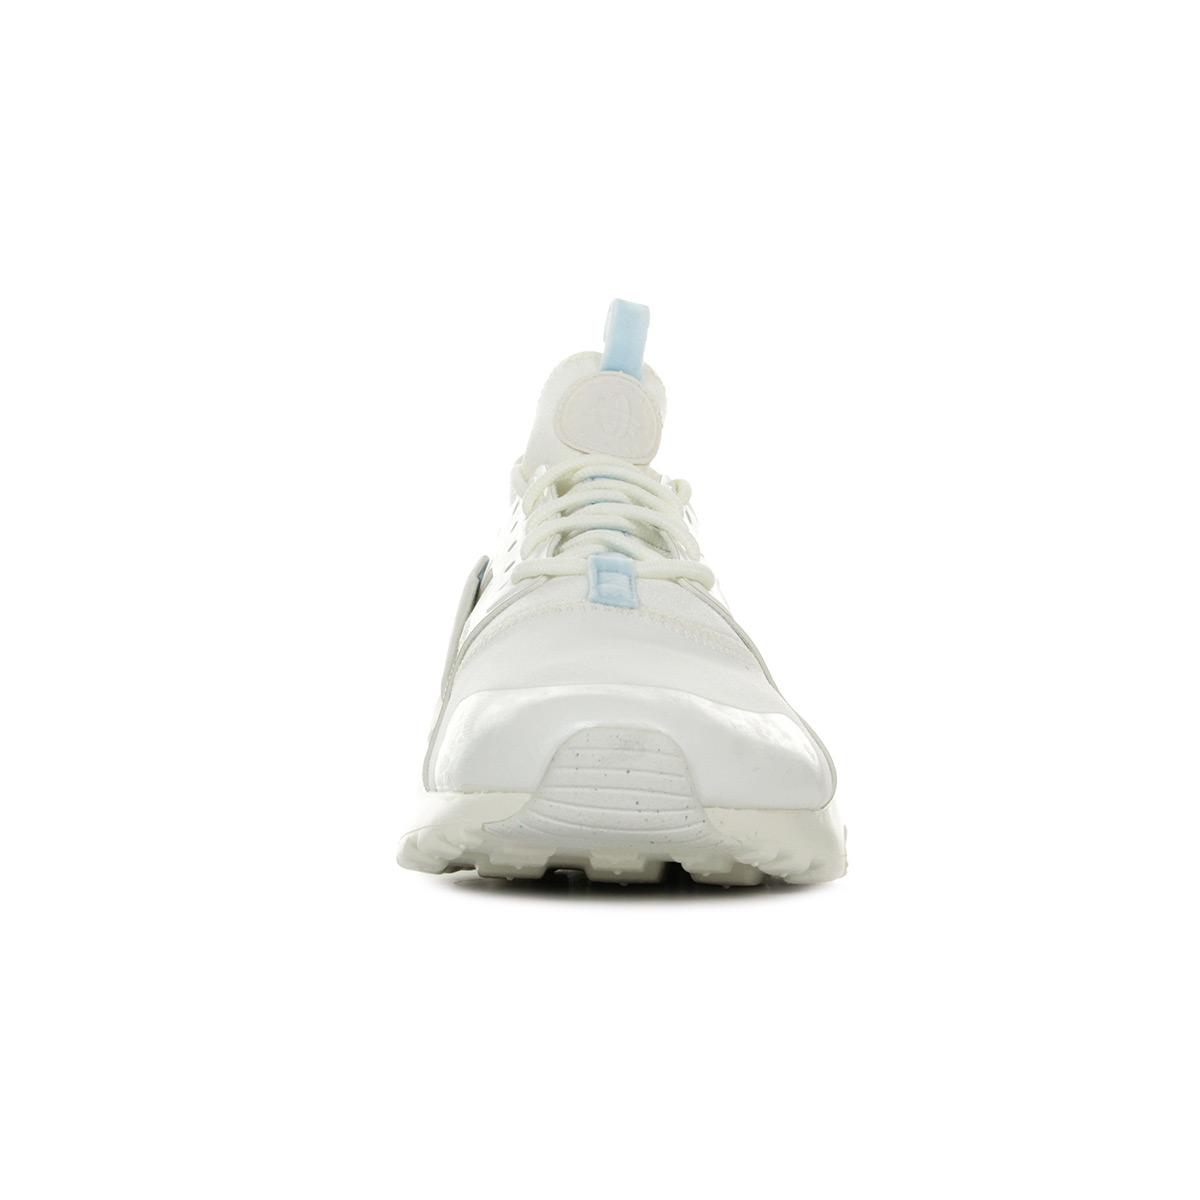 new style 98f4c 8cae9 ... Nike Huarache Run Ultra GS ...